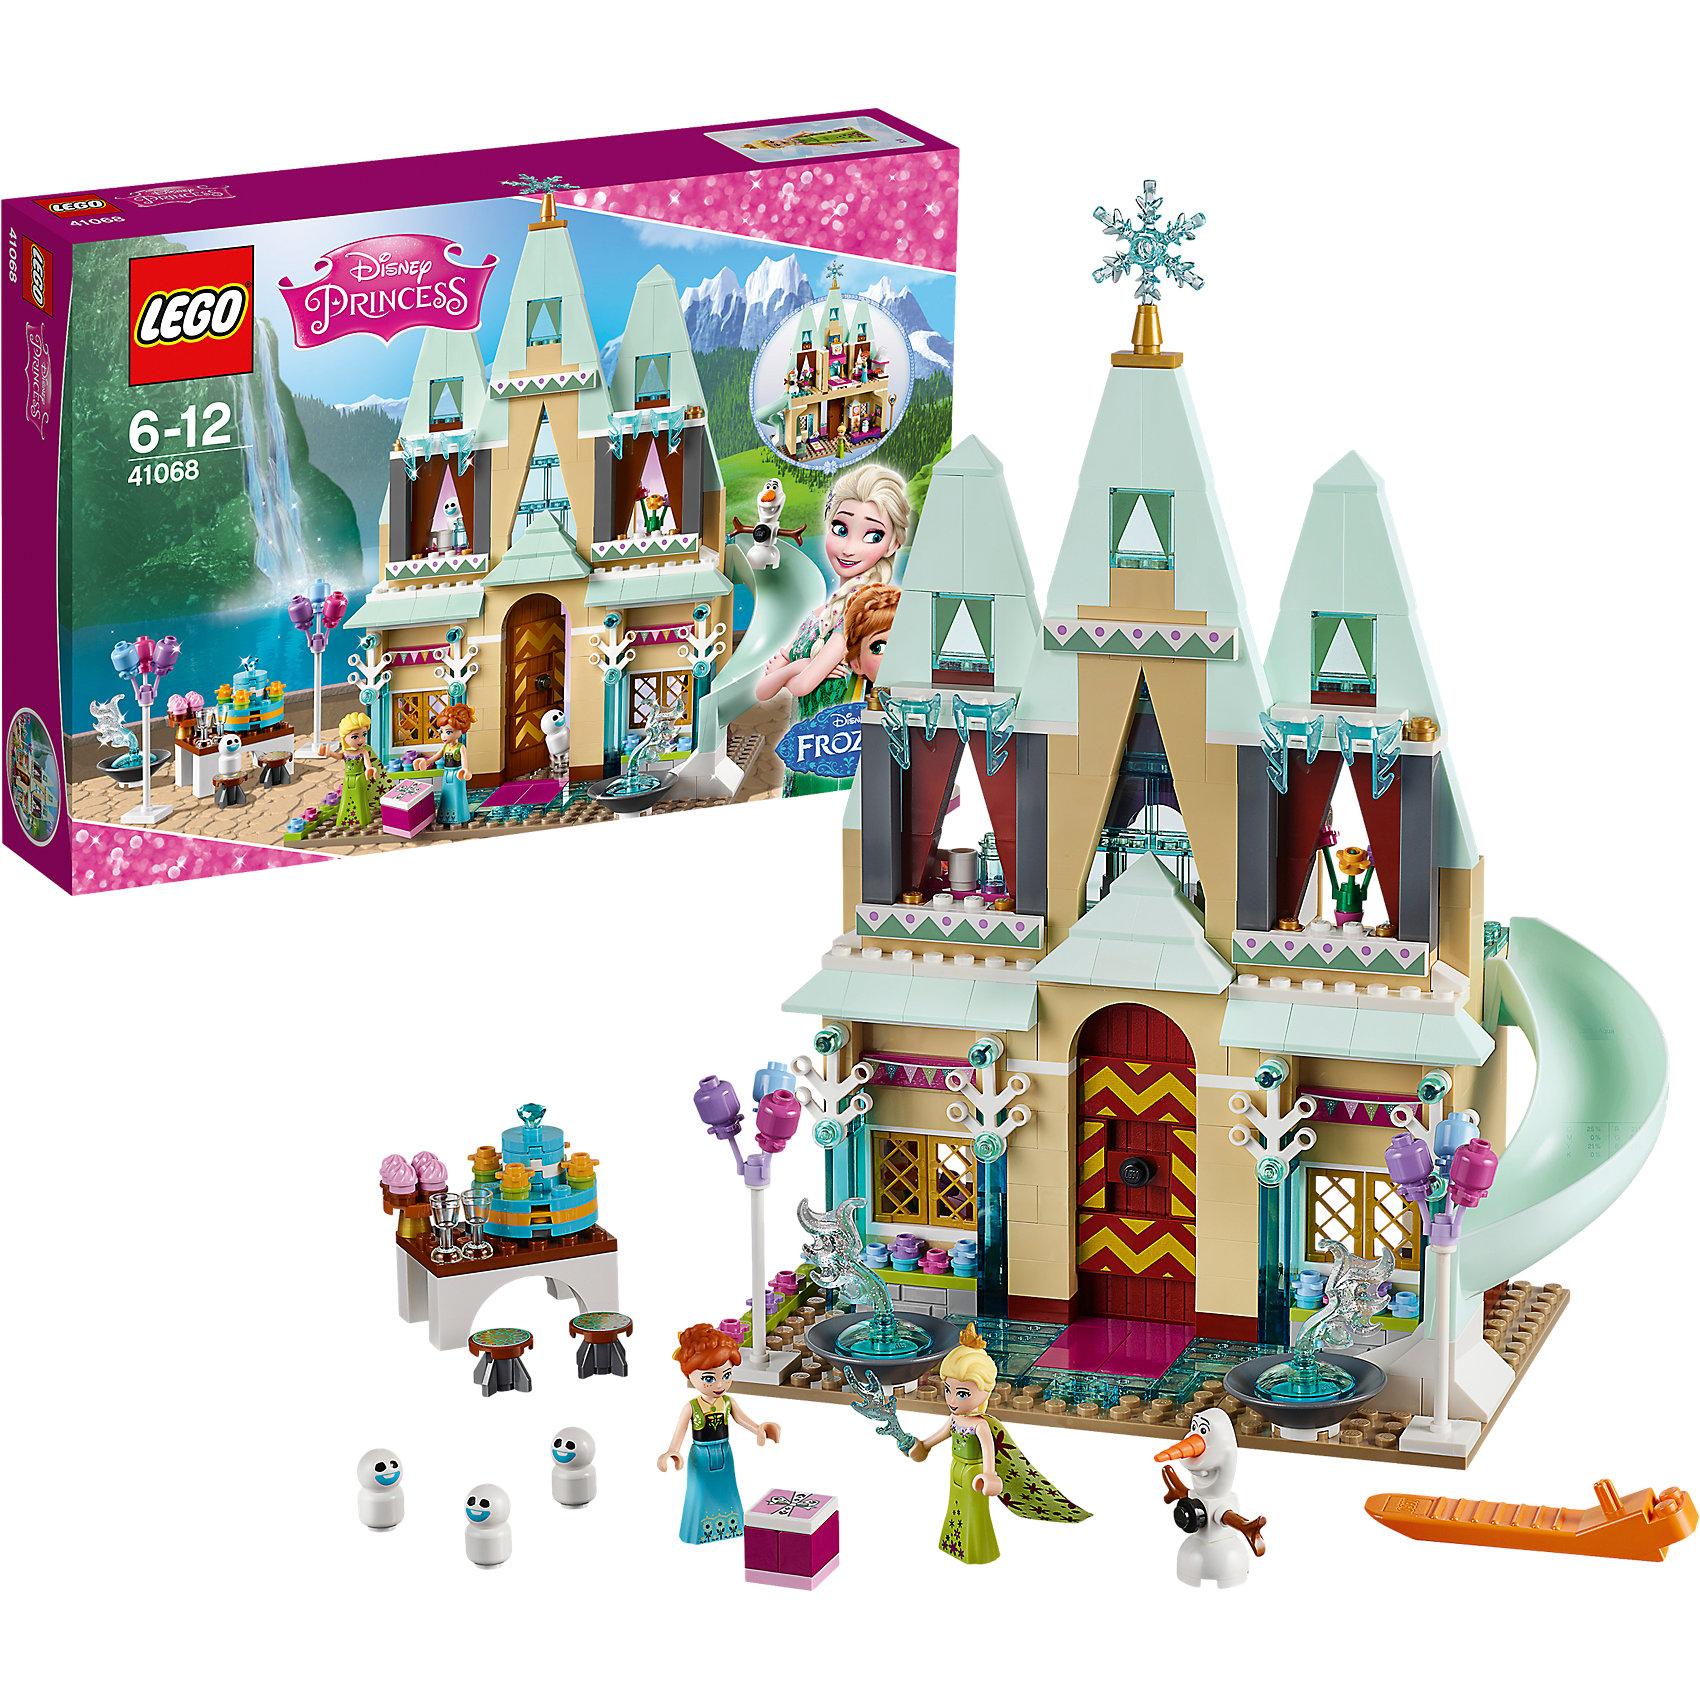 LEGO LEGO Disney Princesses 41068: Праздник в замке Эренделл конструктор lego disney princesses экзотический дворец жасмин 41061